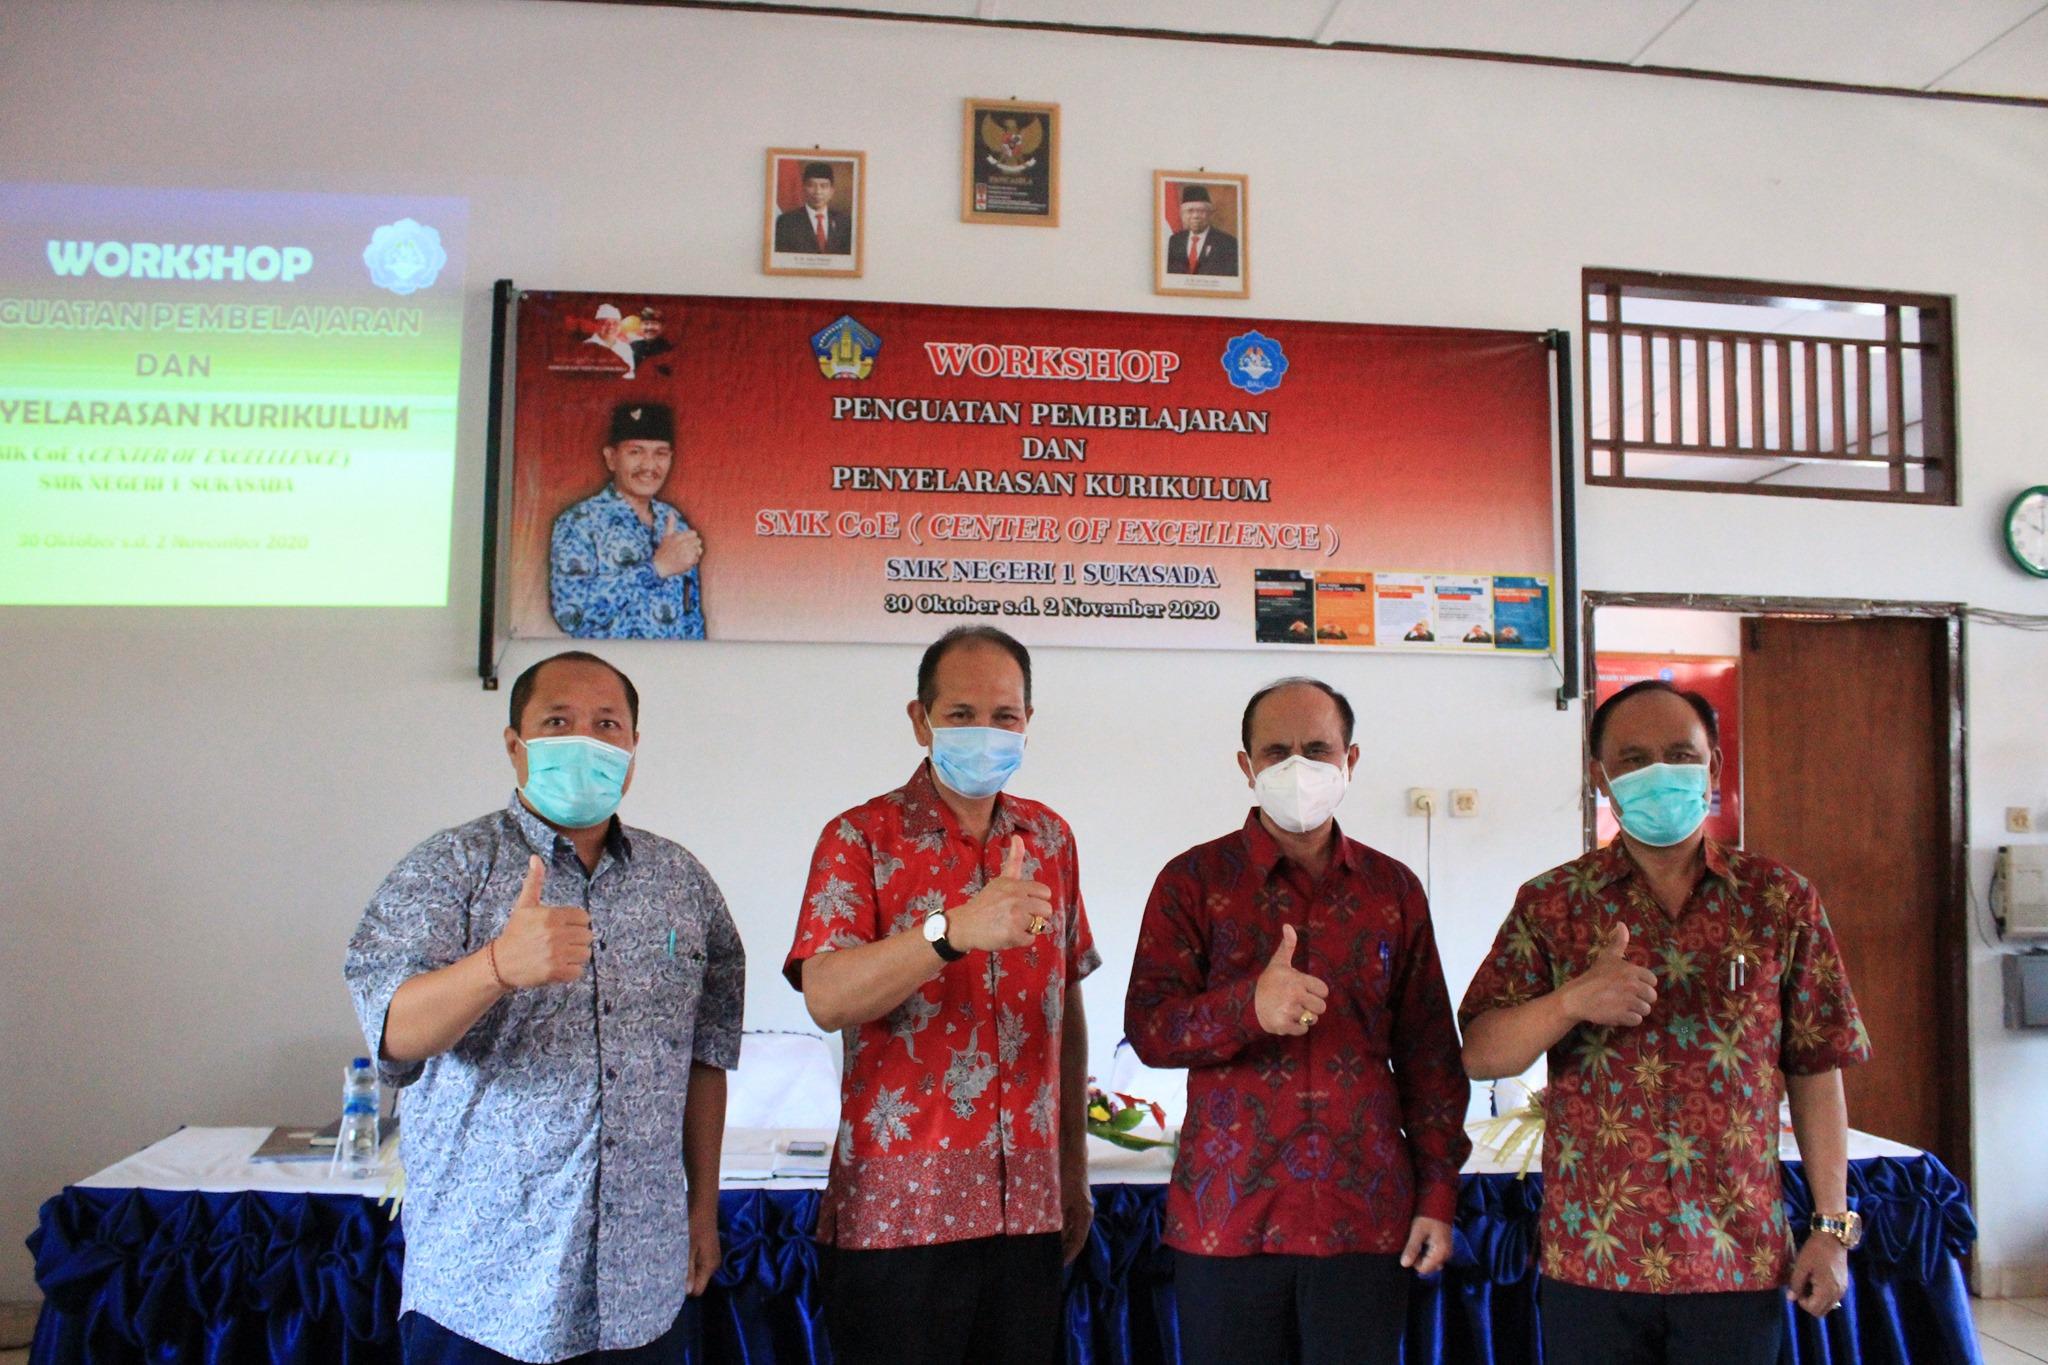 Pembukaan Workshop Penguatan Pembelajaran dan Penyelarasan Kurikulum SMK CoE (Center of Excellence)